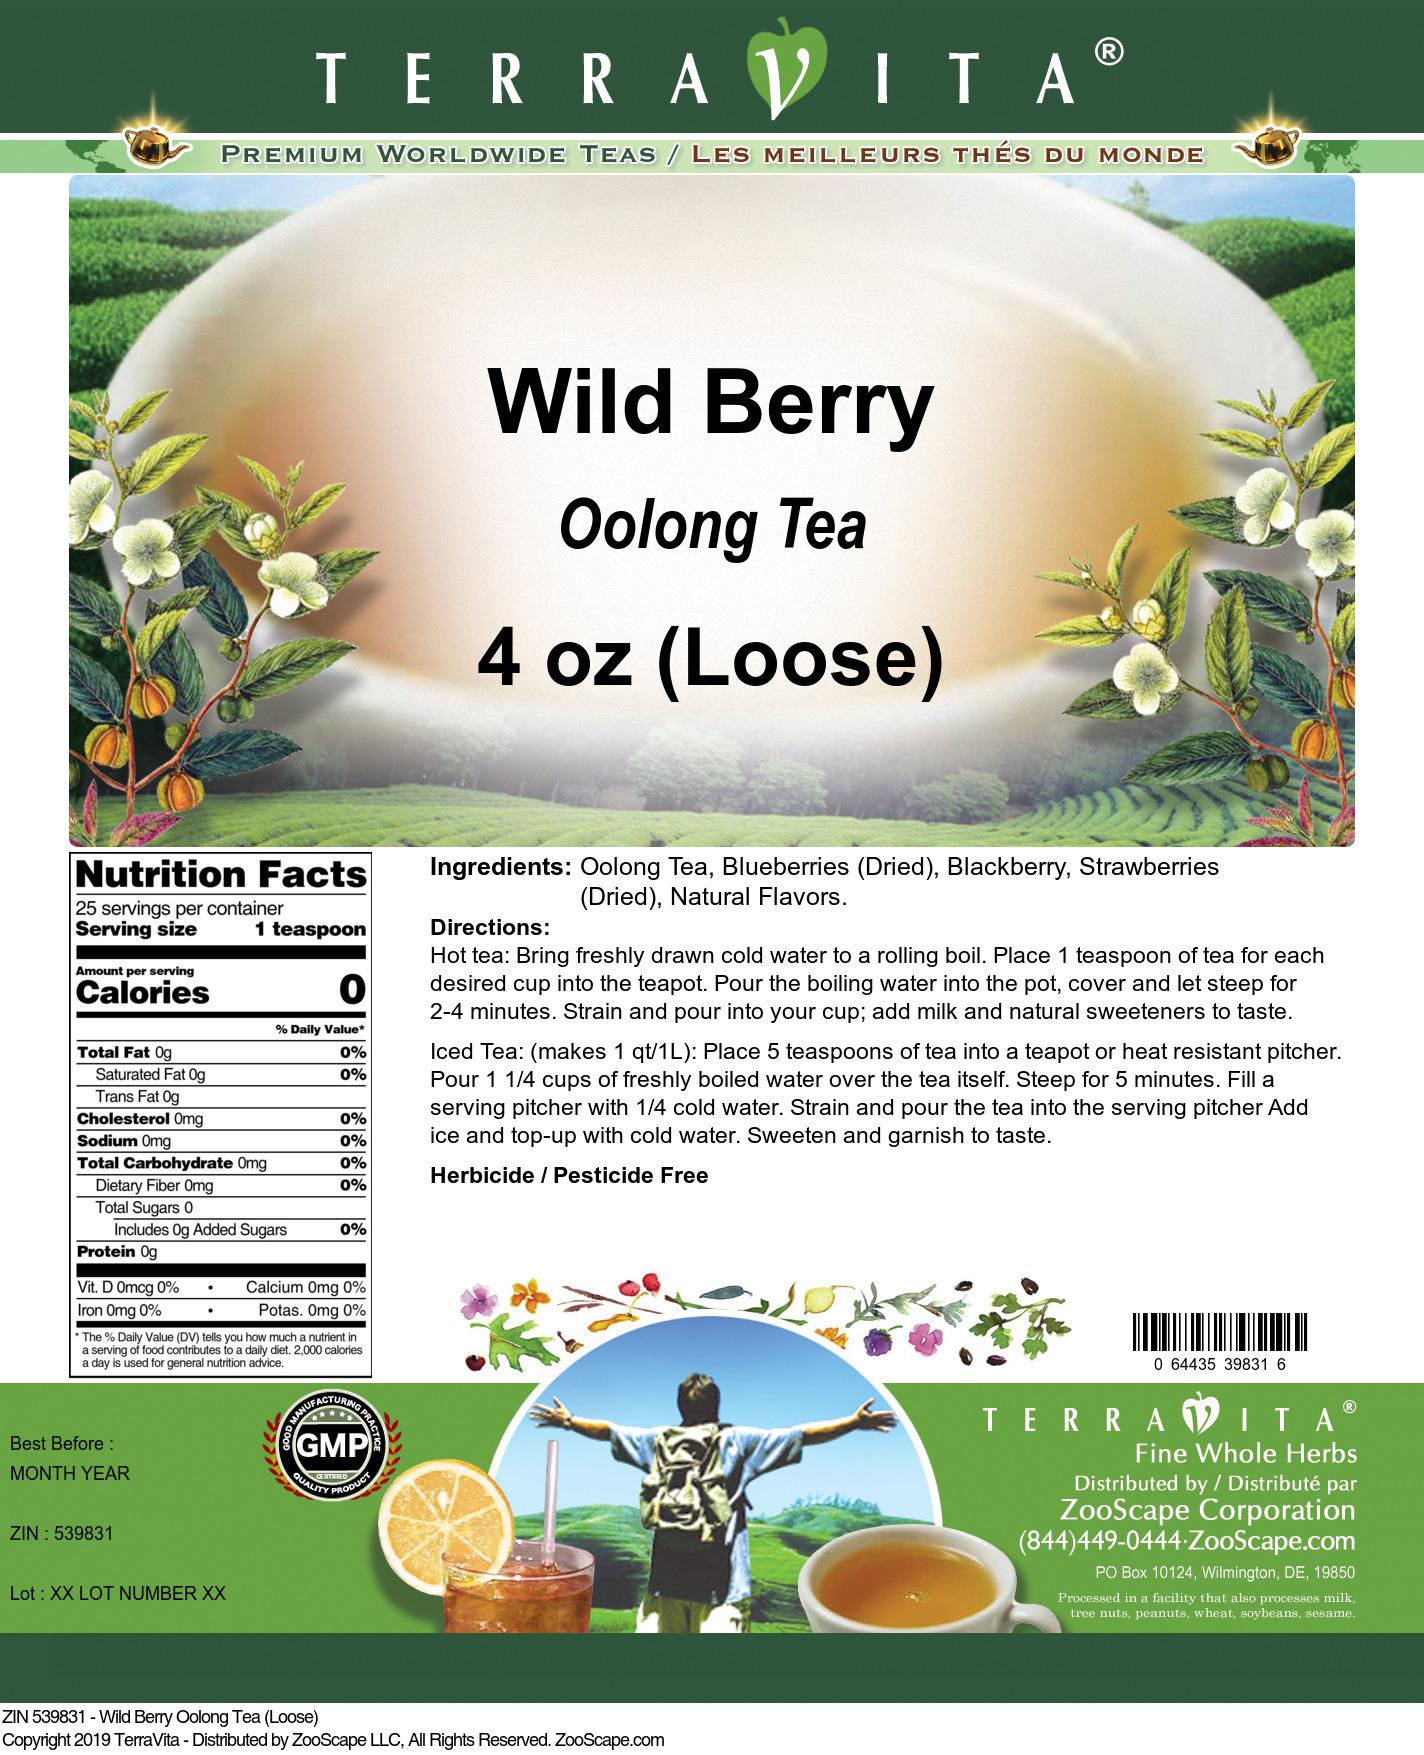 Wild Berry Oolong Tea (Loose)